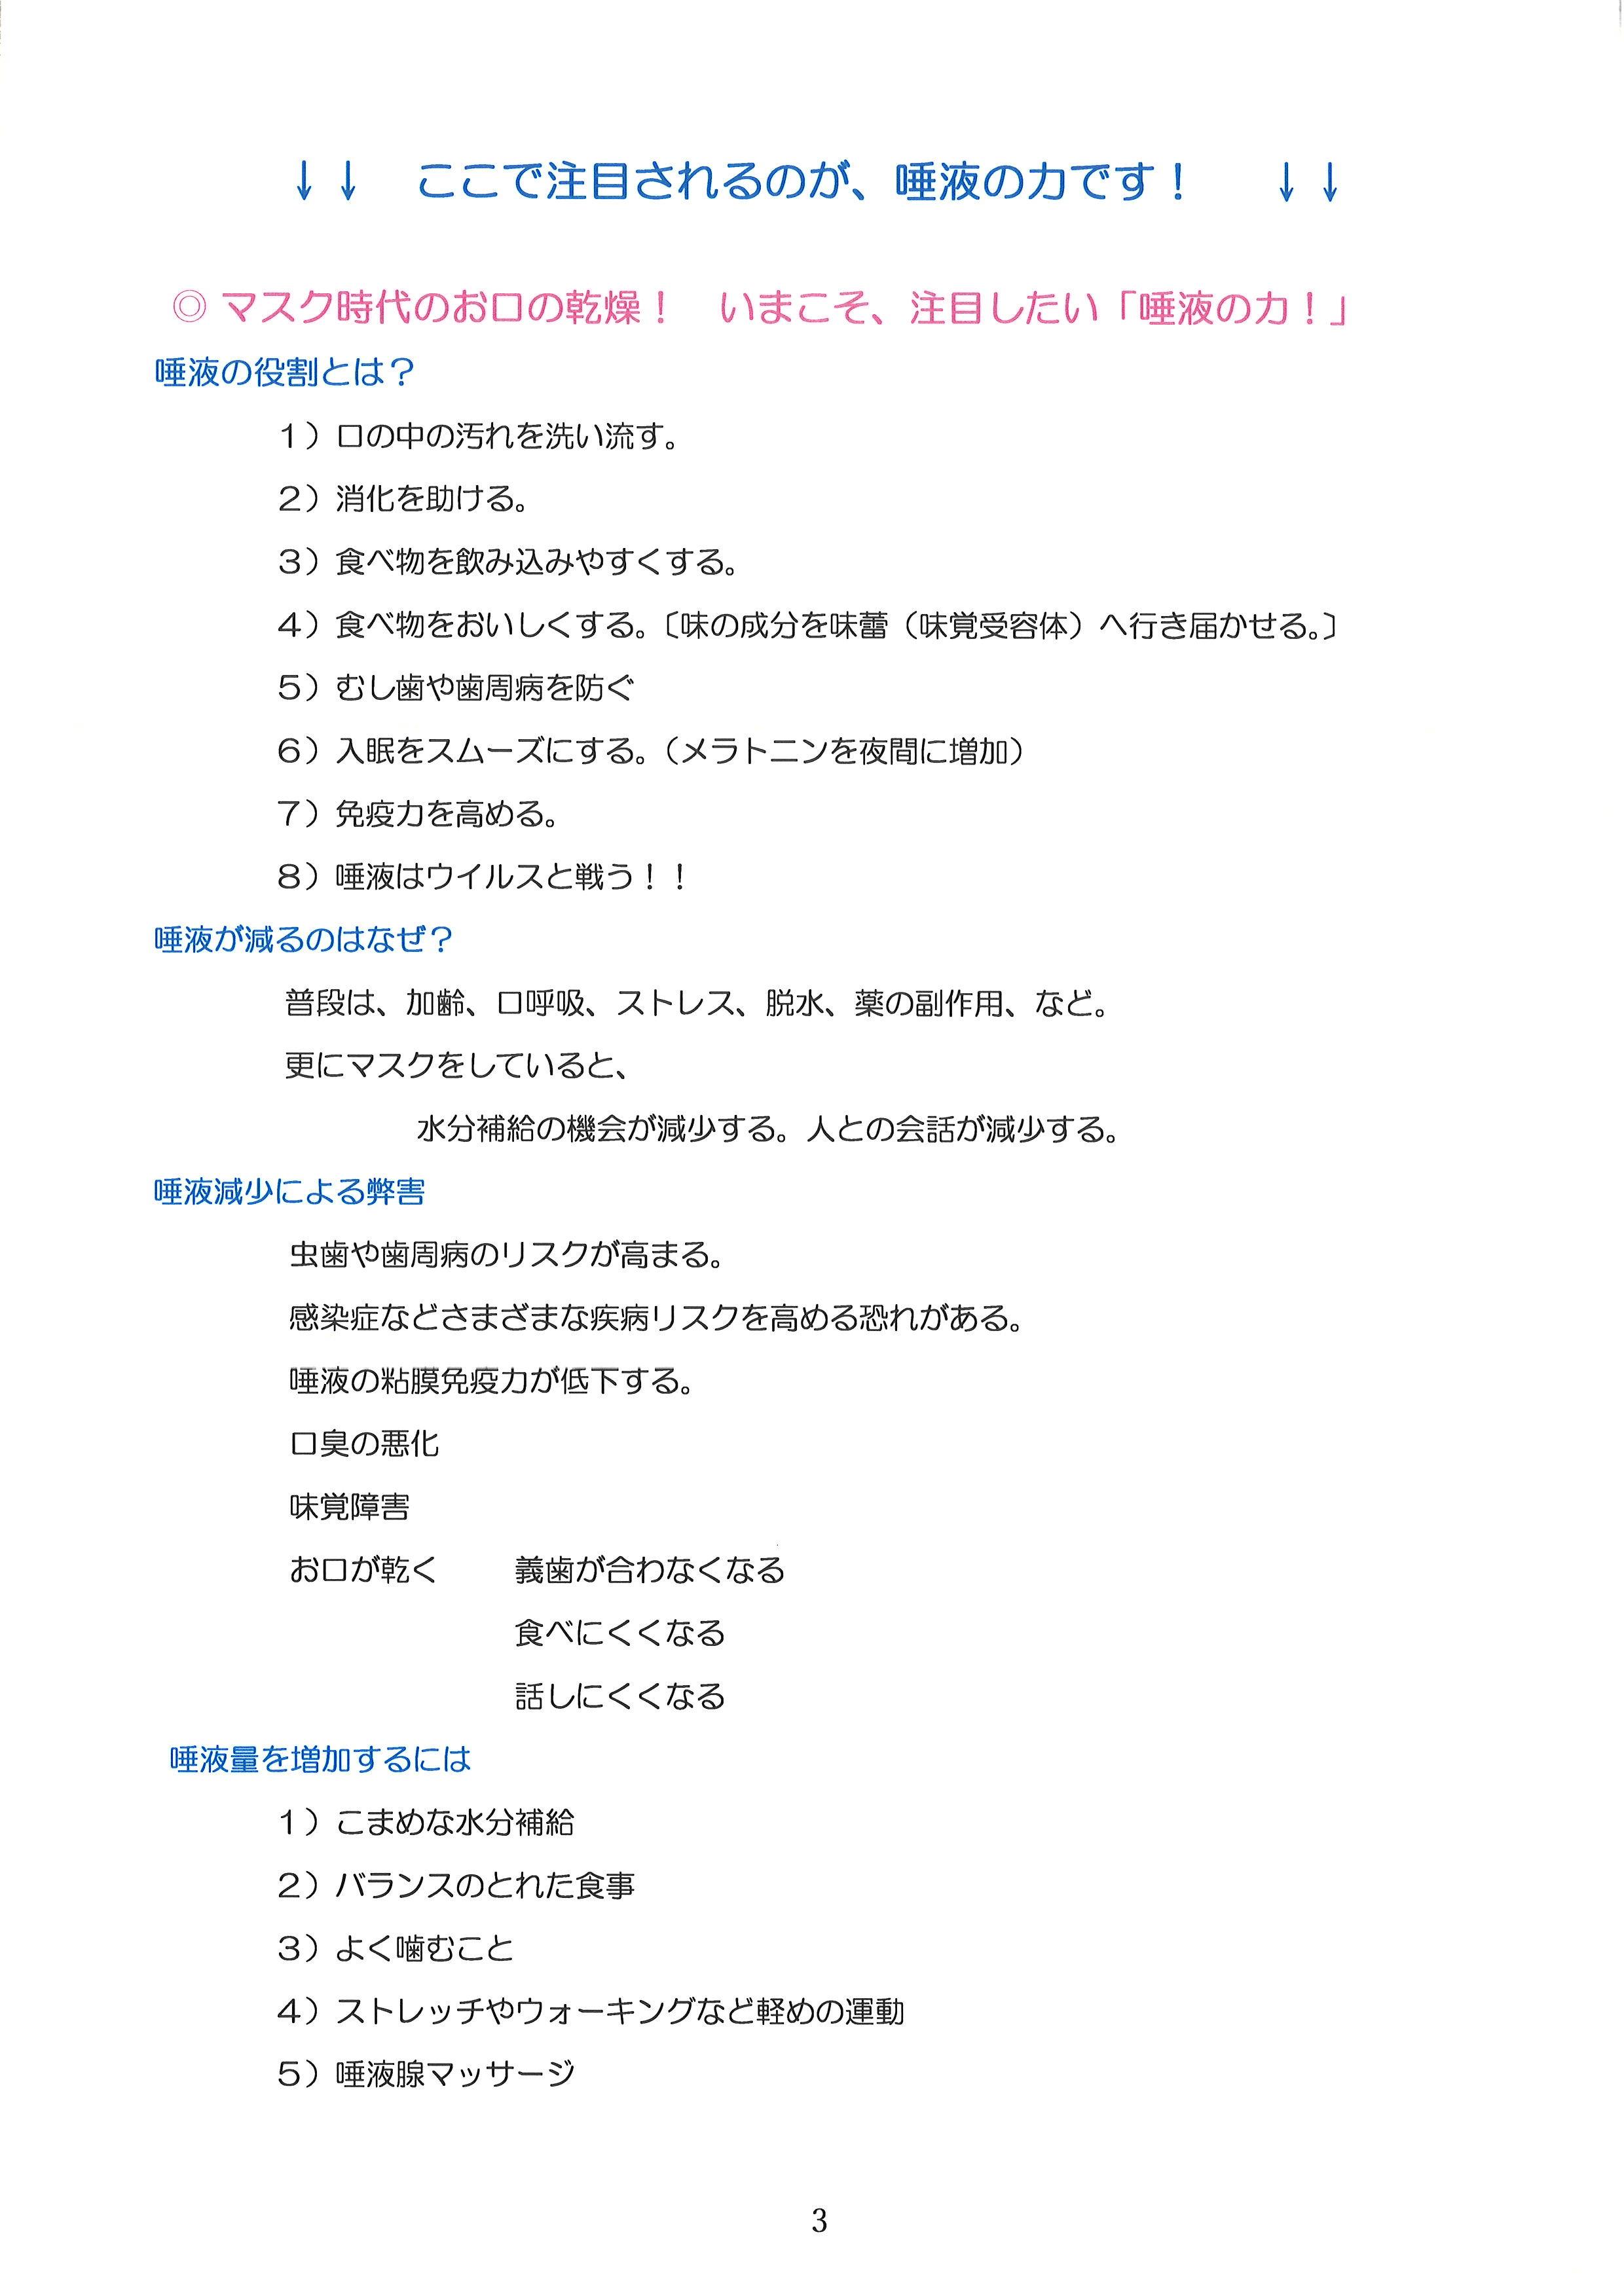 https://www.suminasu.or.jp/global-data/20210514154410686.jpg